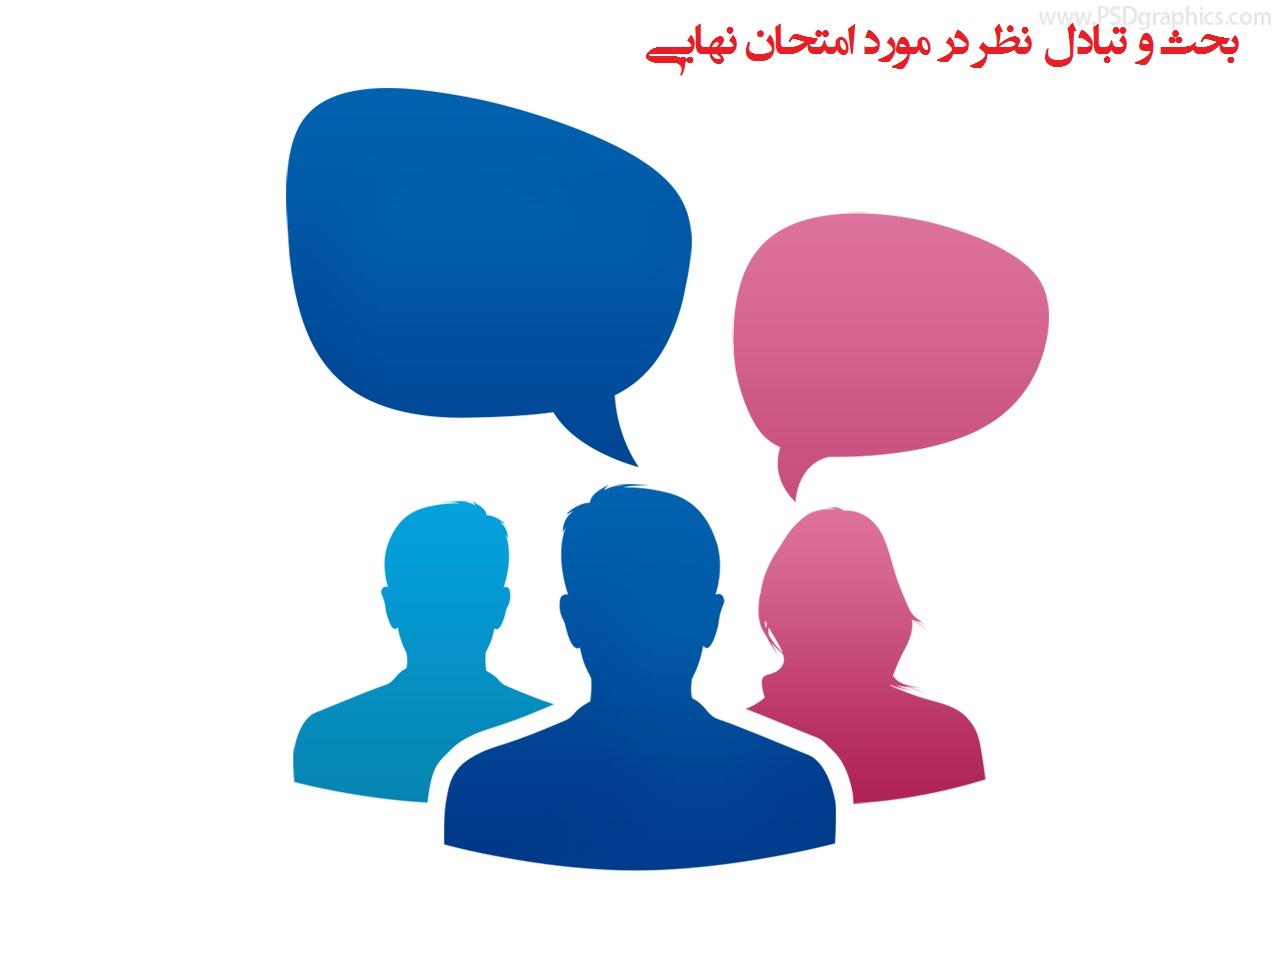 فارسی شدن تلگرام